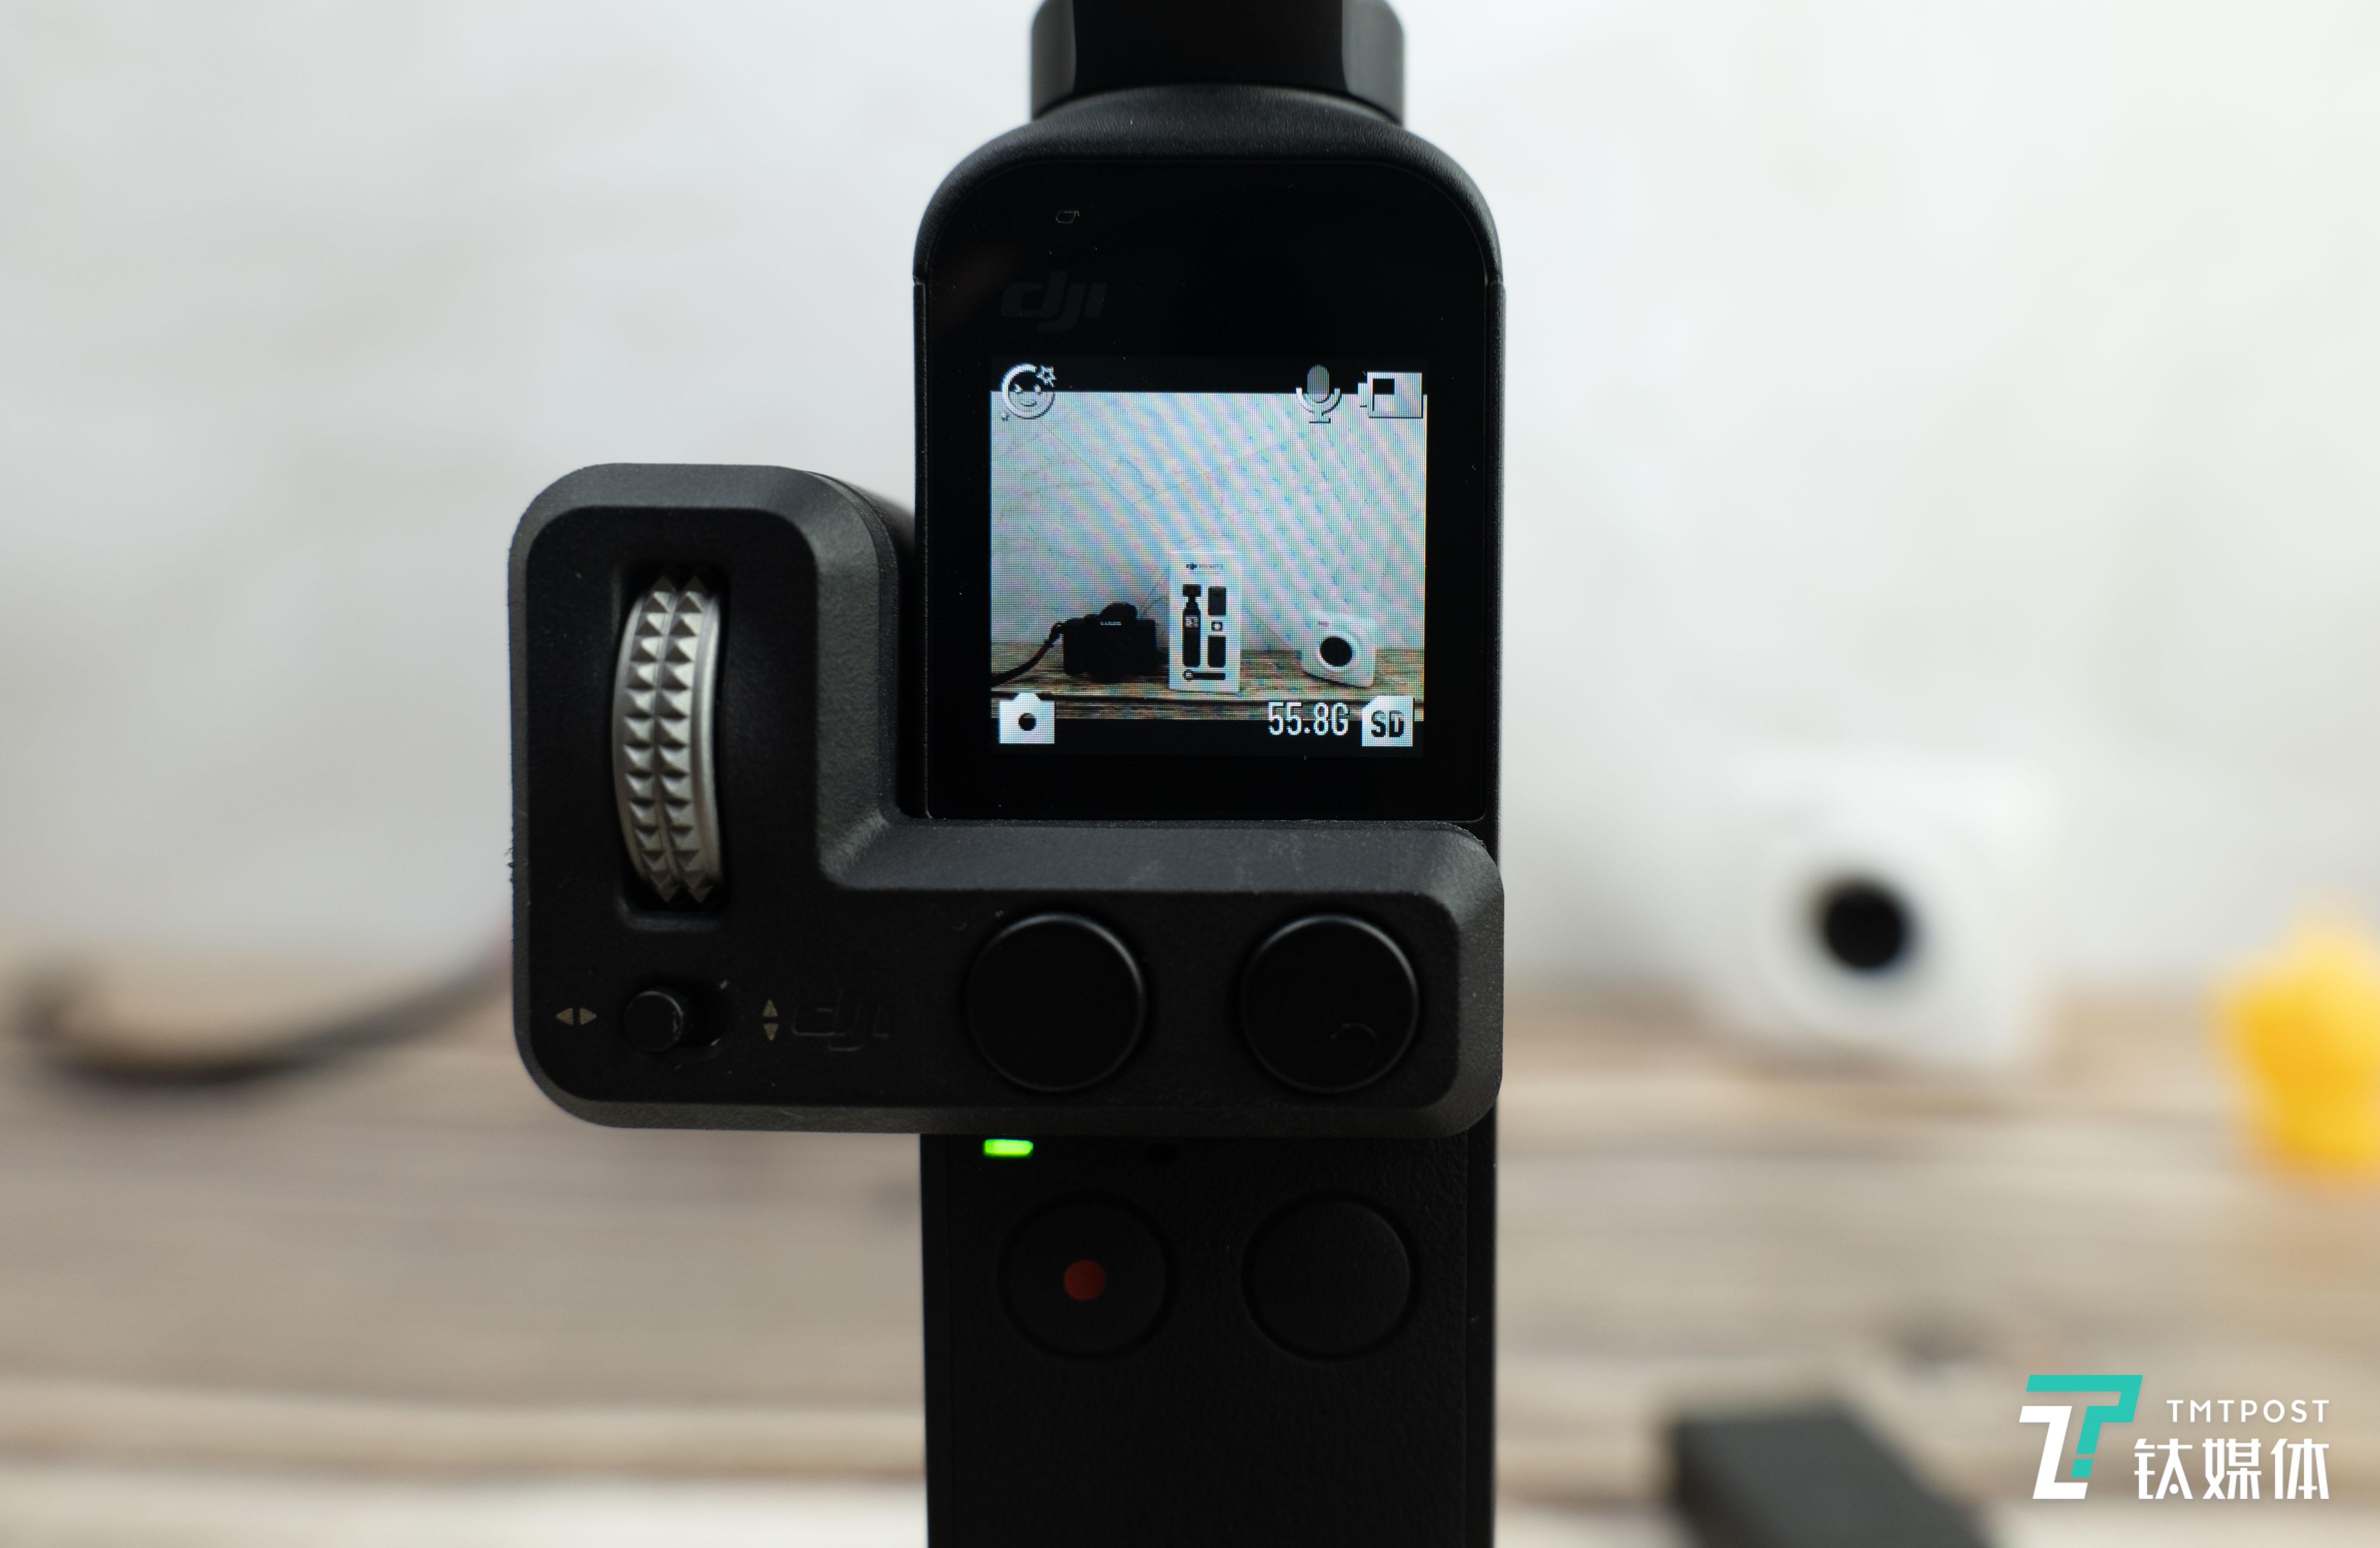 Pocket 2未安装增广镜(注意画面边缘的小黄鸭)